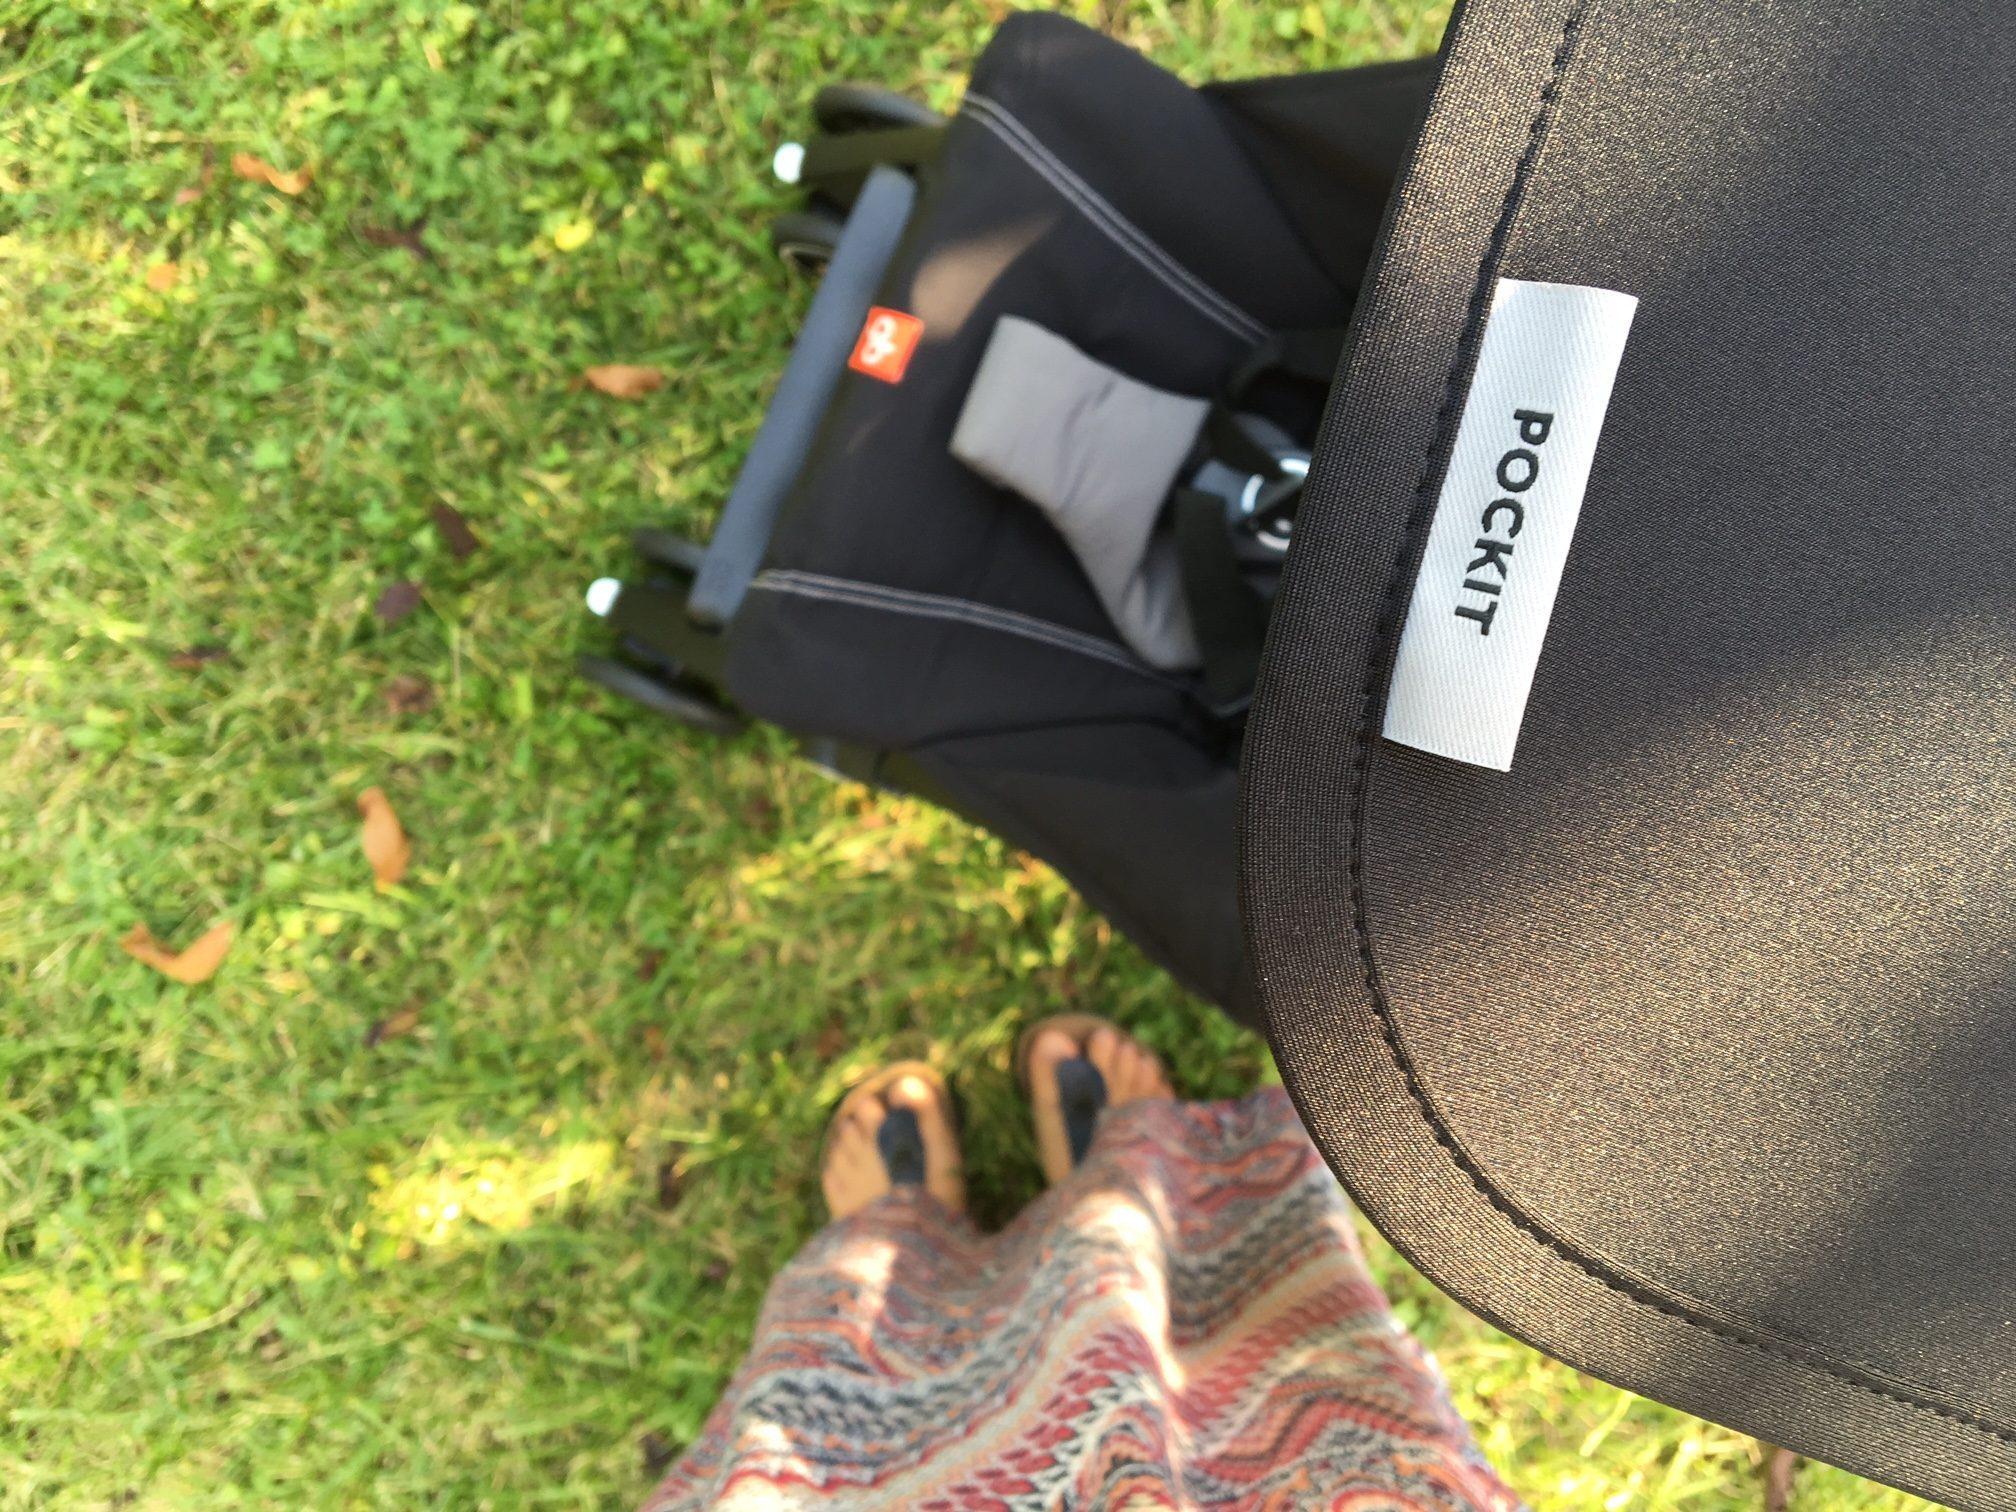 pockit-passeggino-dettaglio